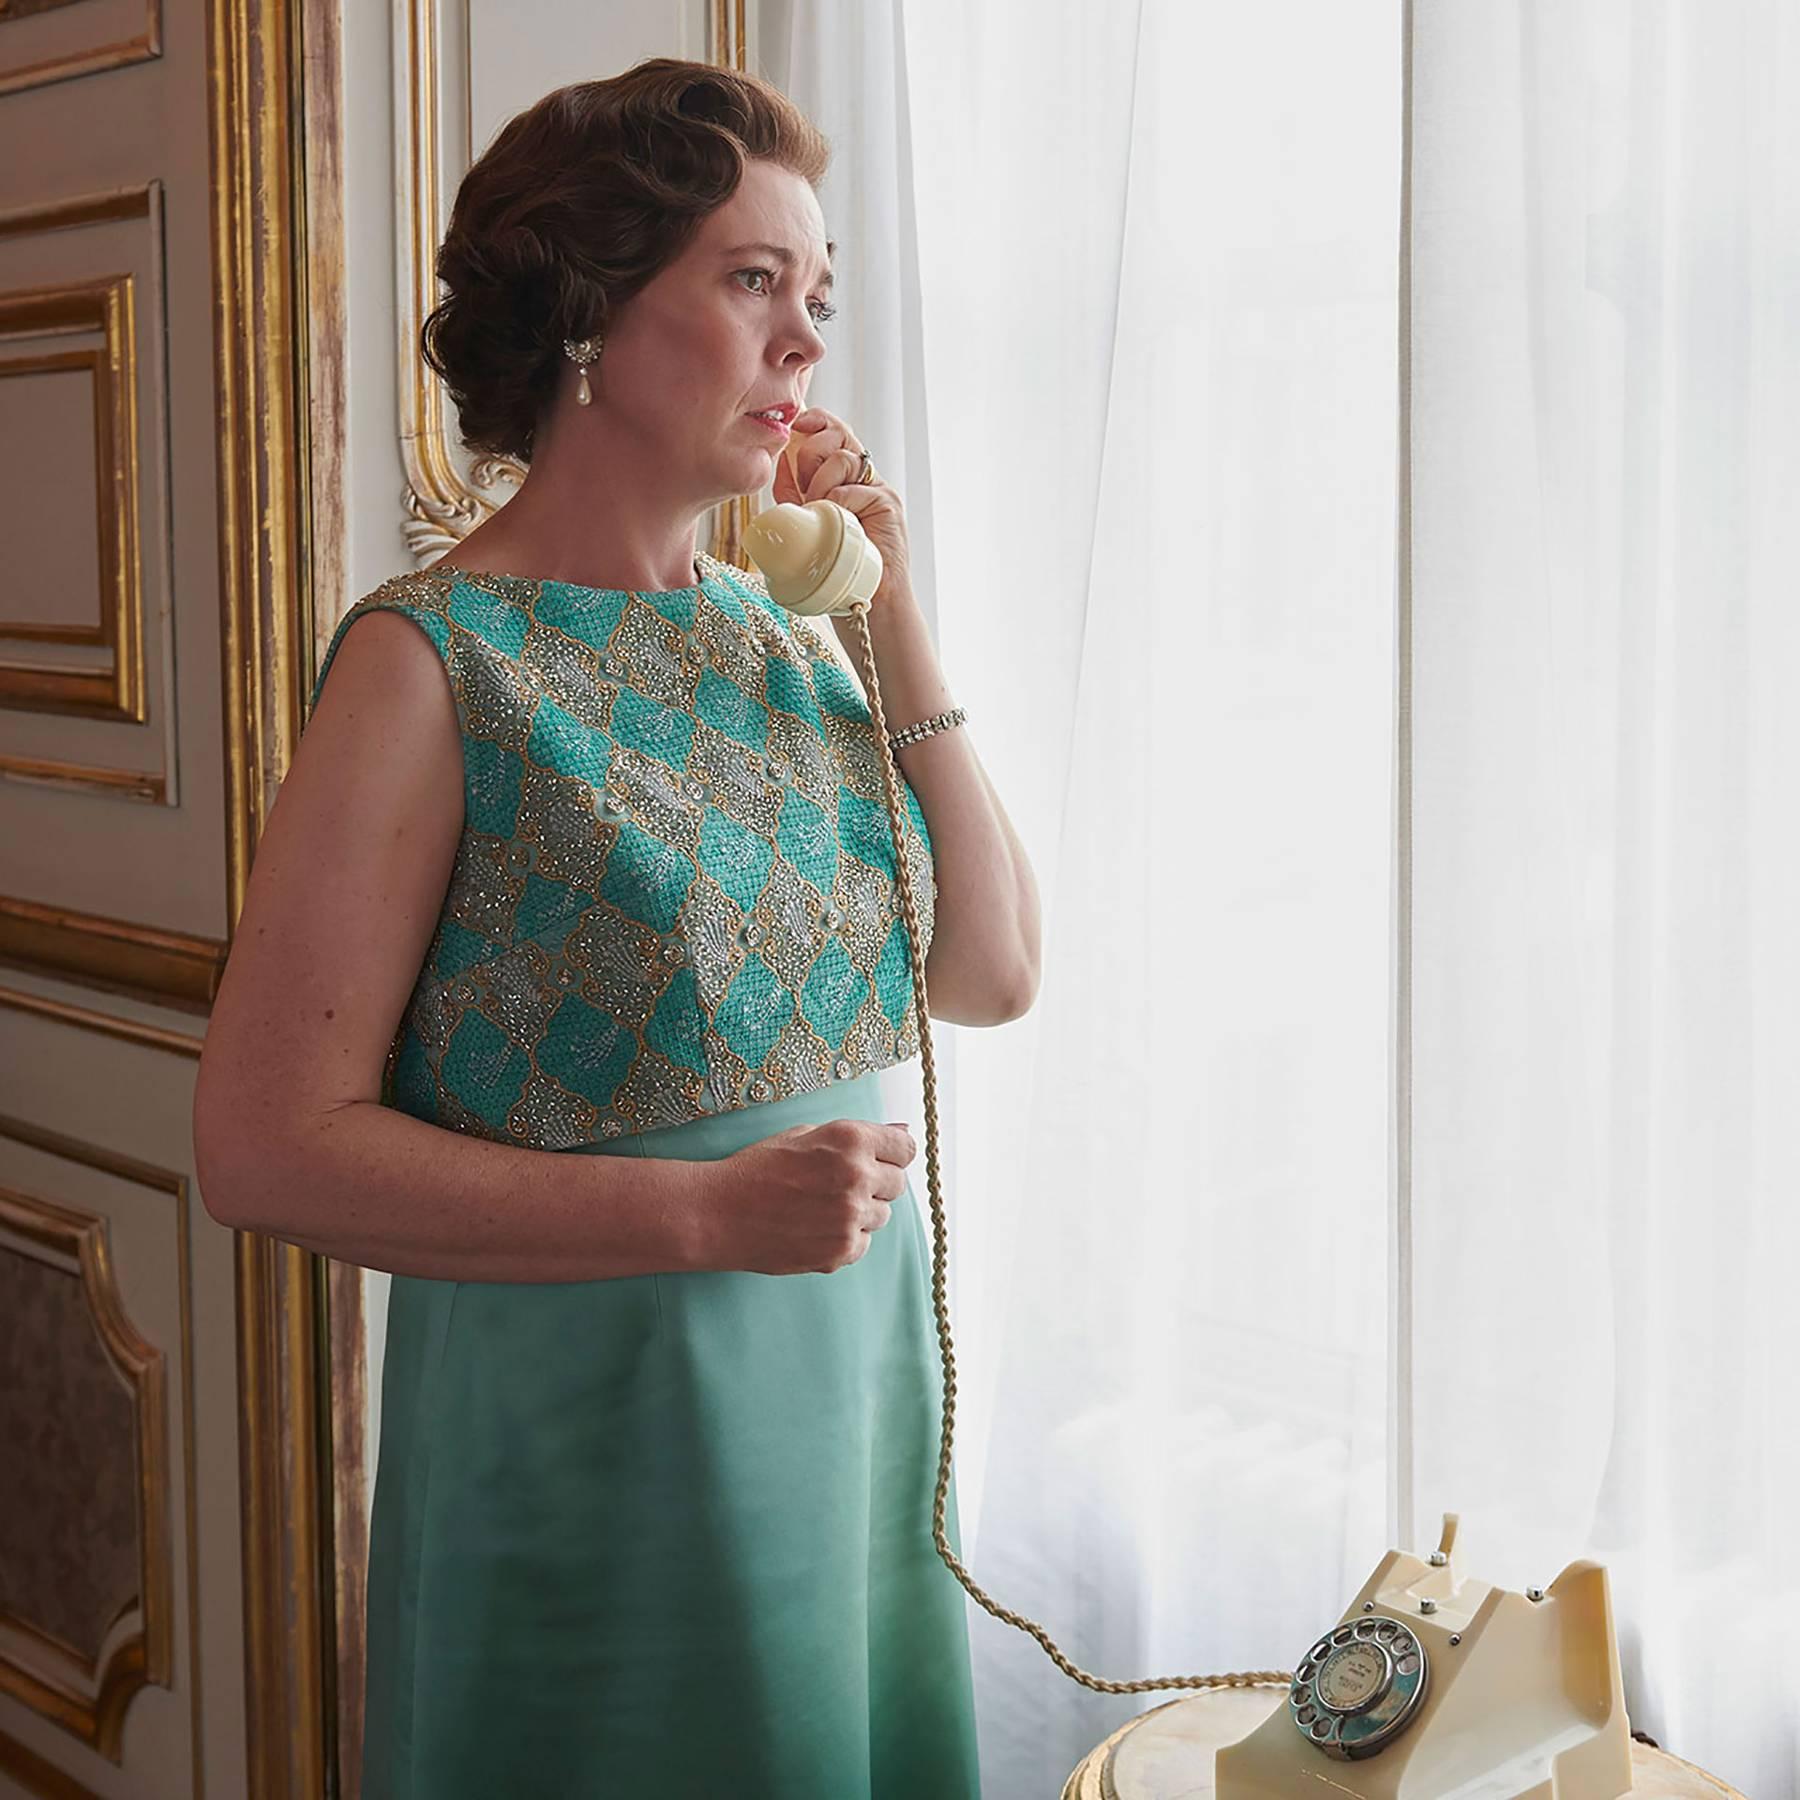 Unprecedented UK-wide premiere for The Crown Season 3